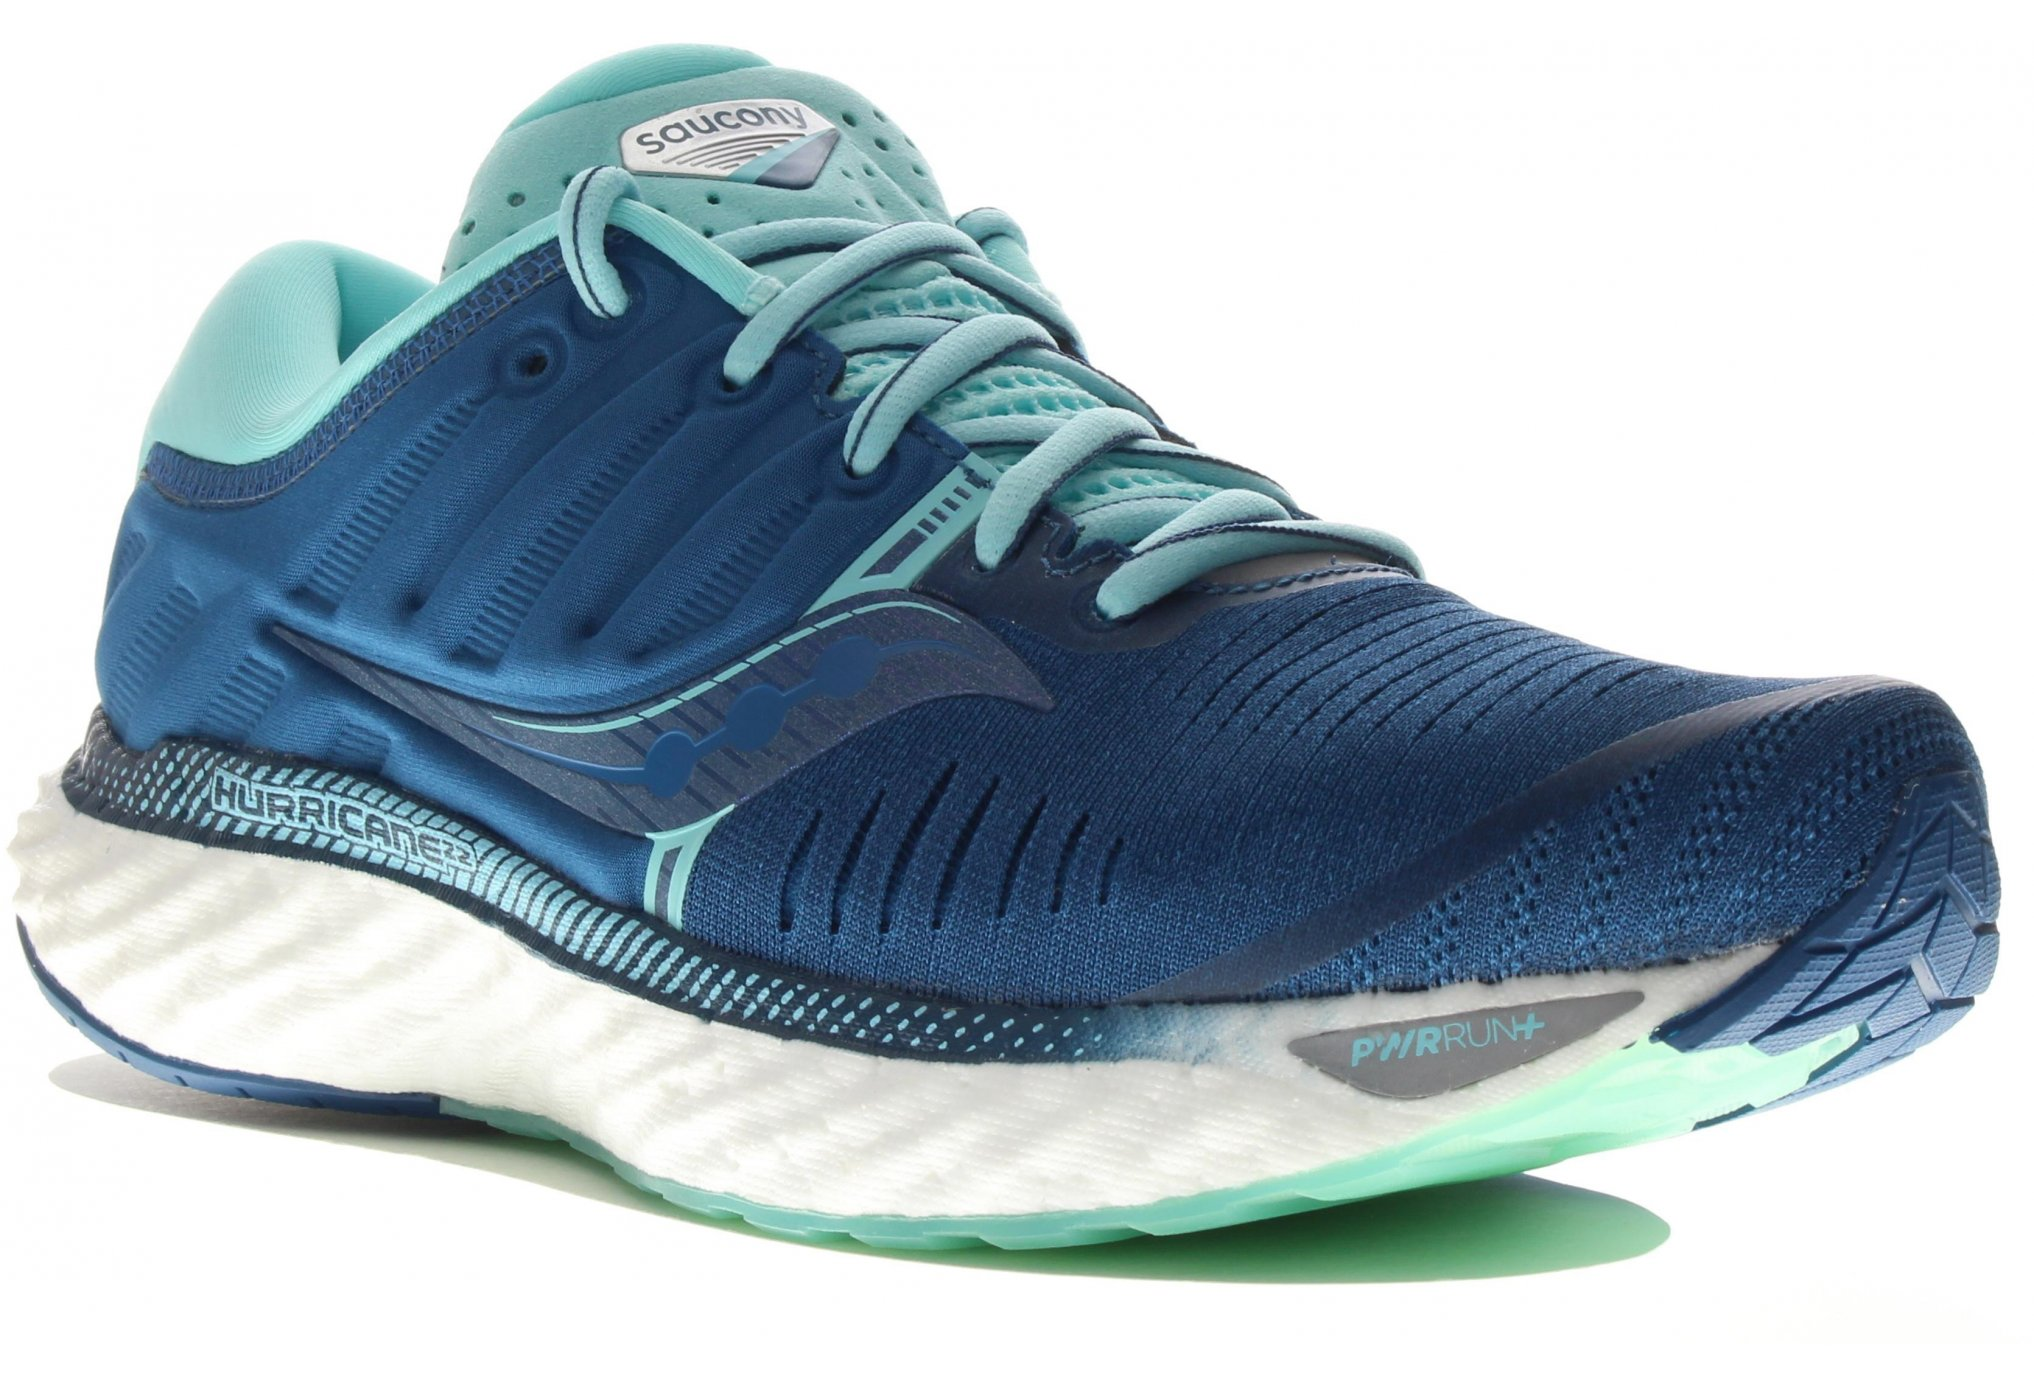 Saucony Hurricane 22 Chaussures running femme